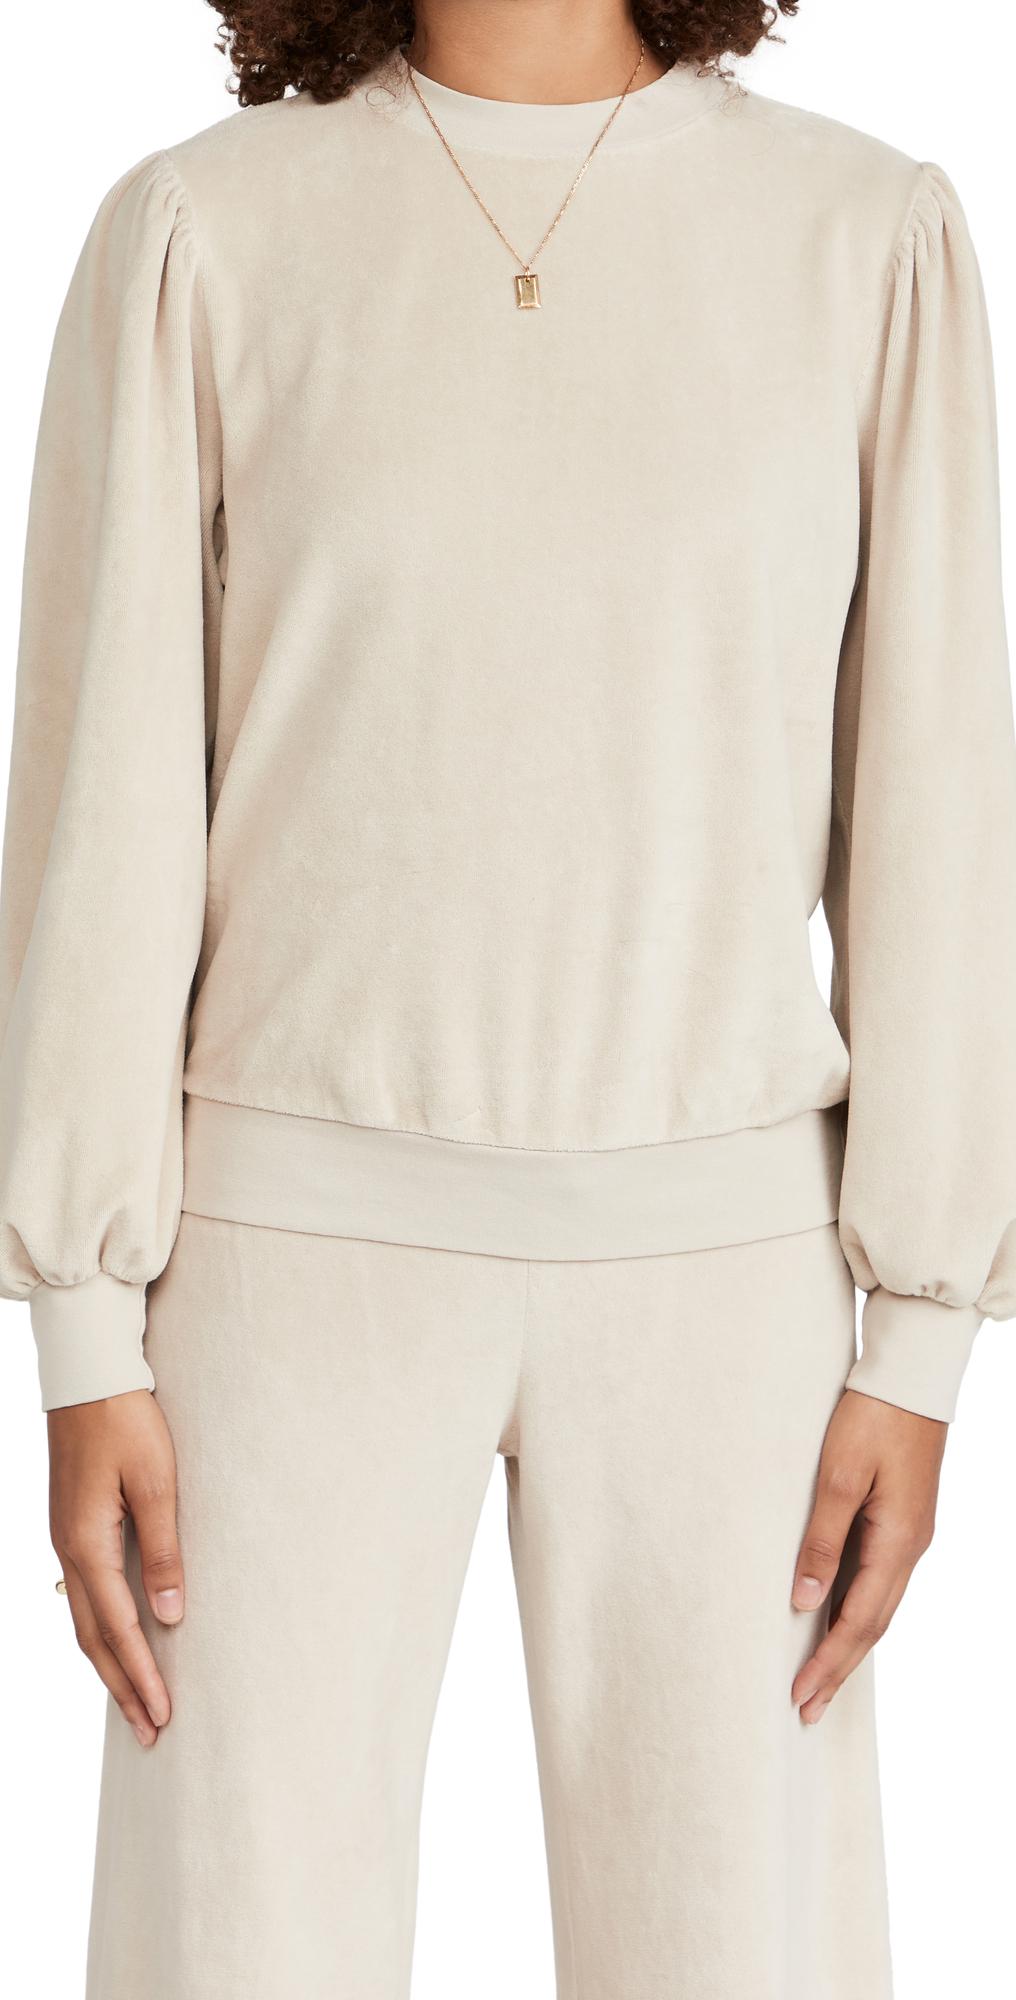 Velour Long Sleeve Puff Shoulder Top